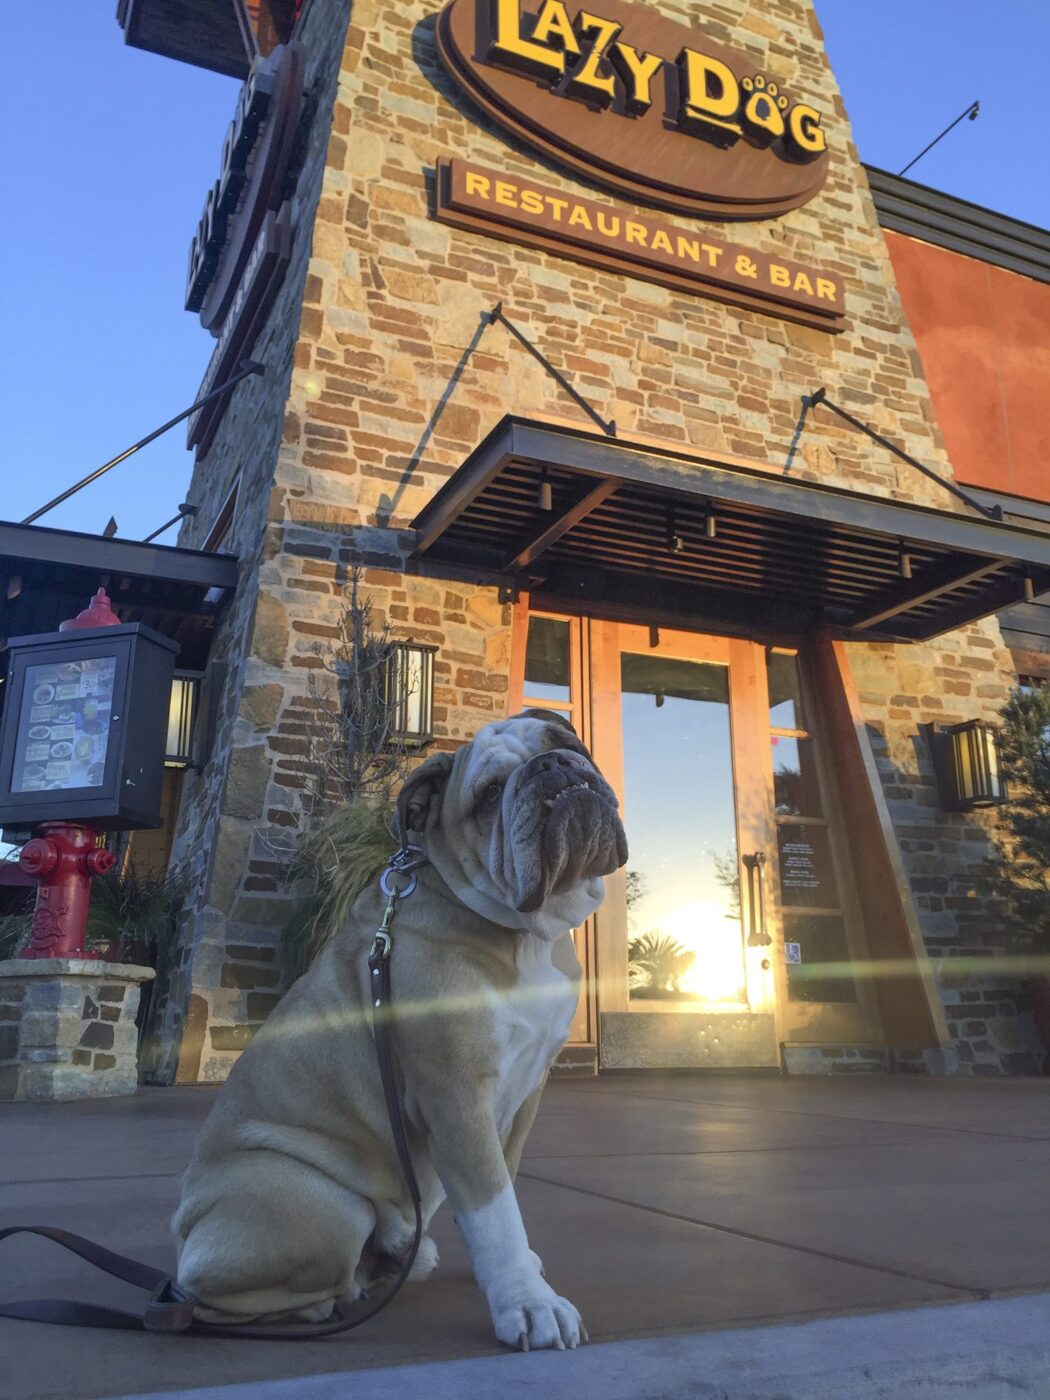 restaurant-with-dog-menu